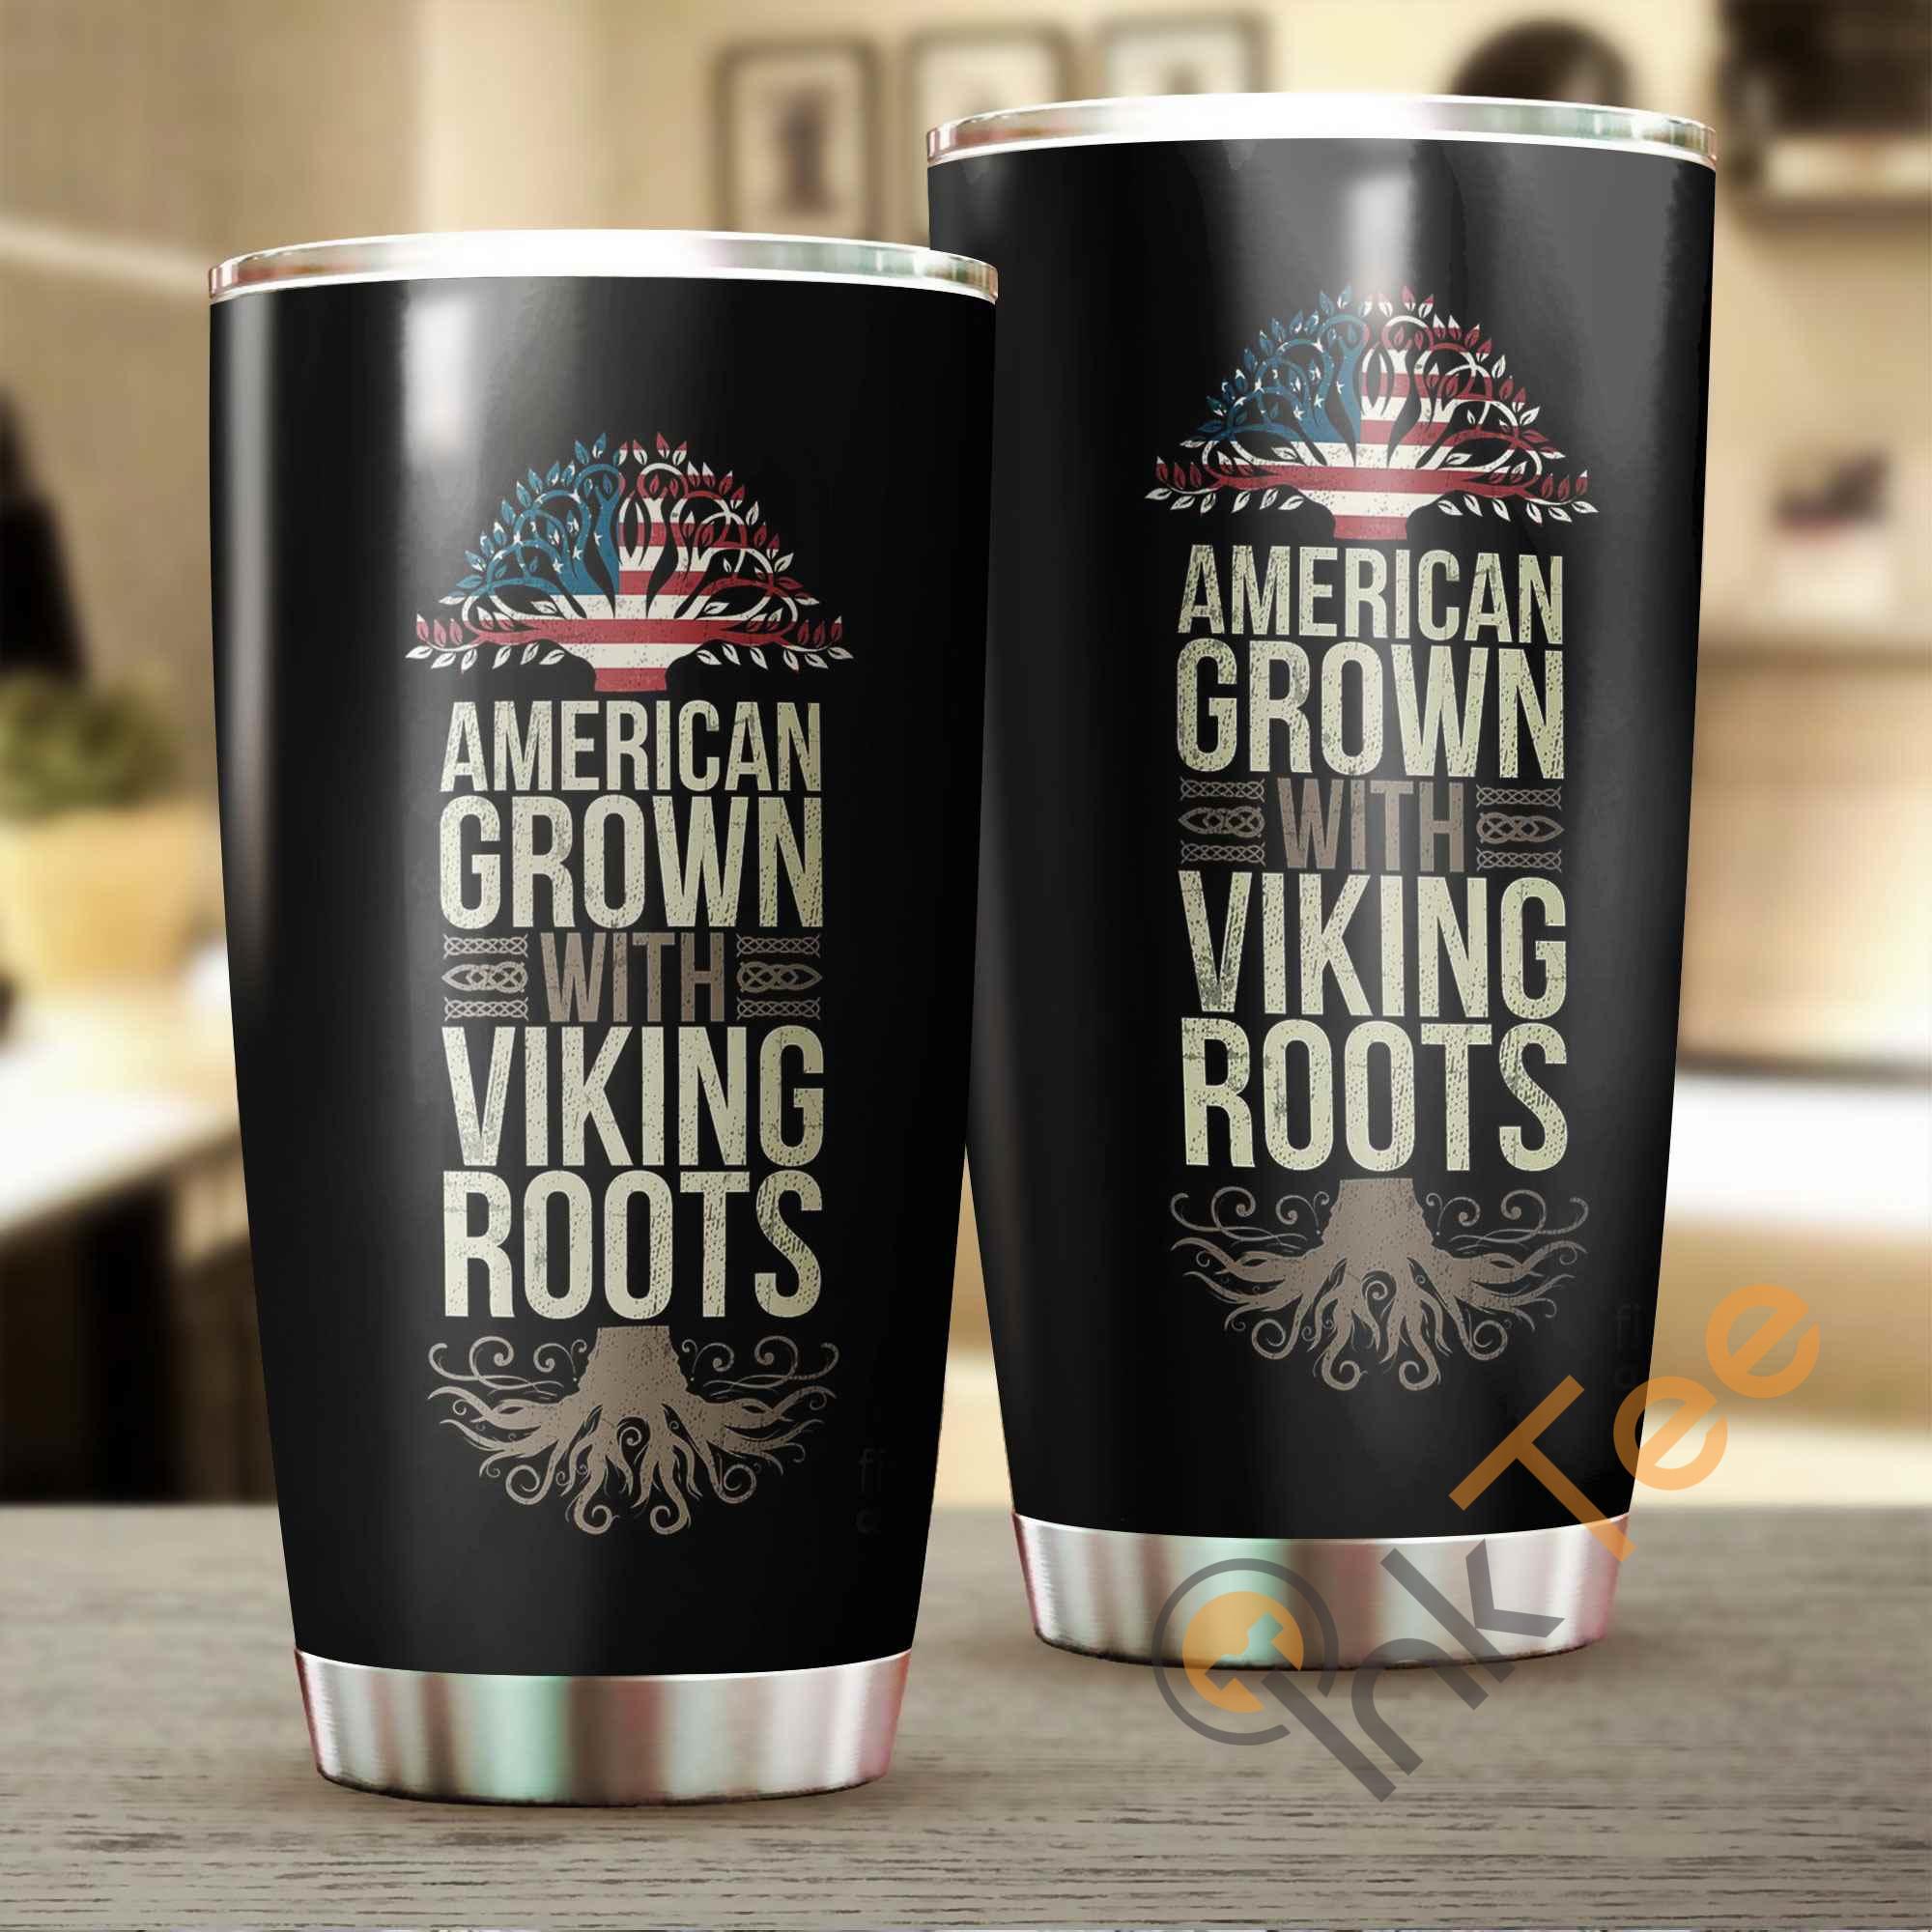 America Grown With Viking Roots Amazon Best Seller Sku 3834 Stainless Steel Tumbler